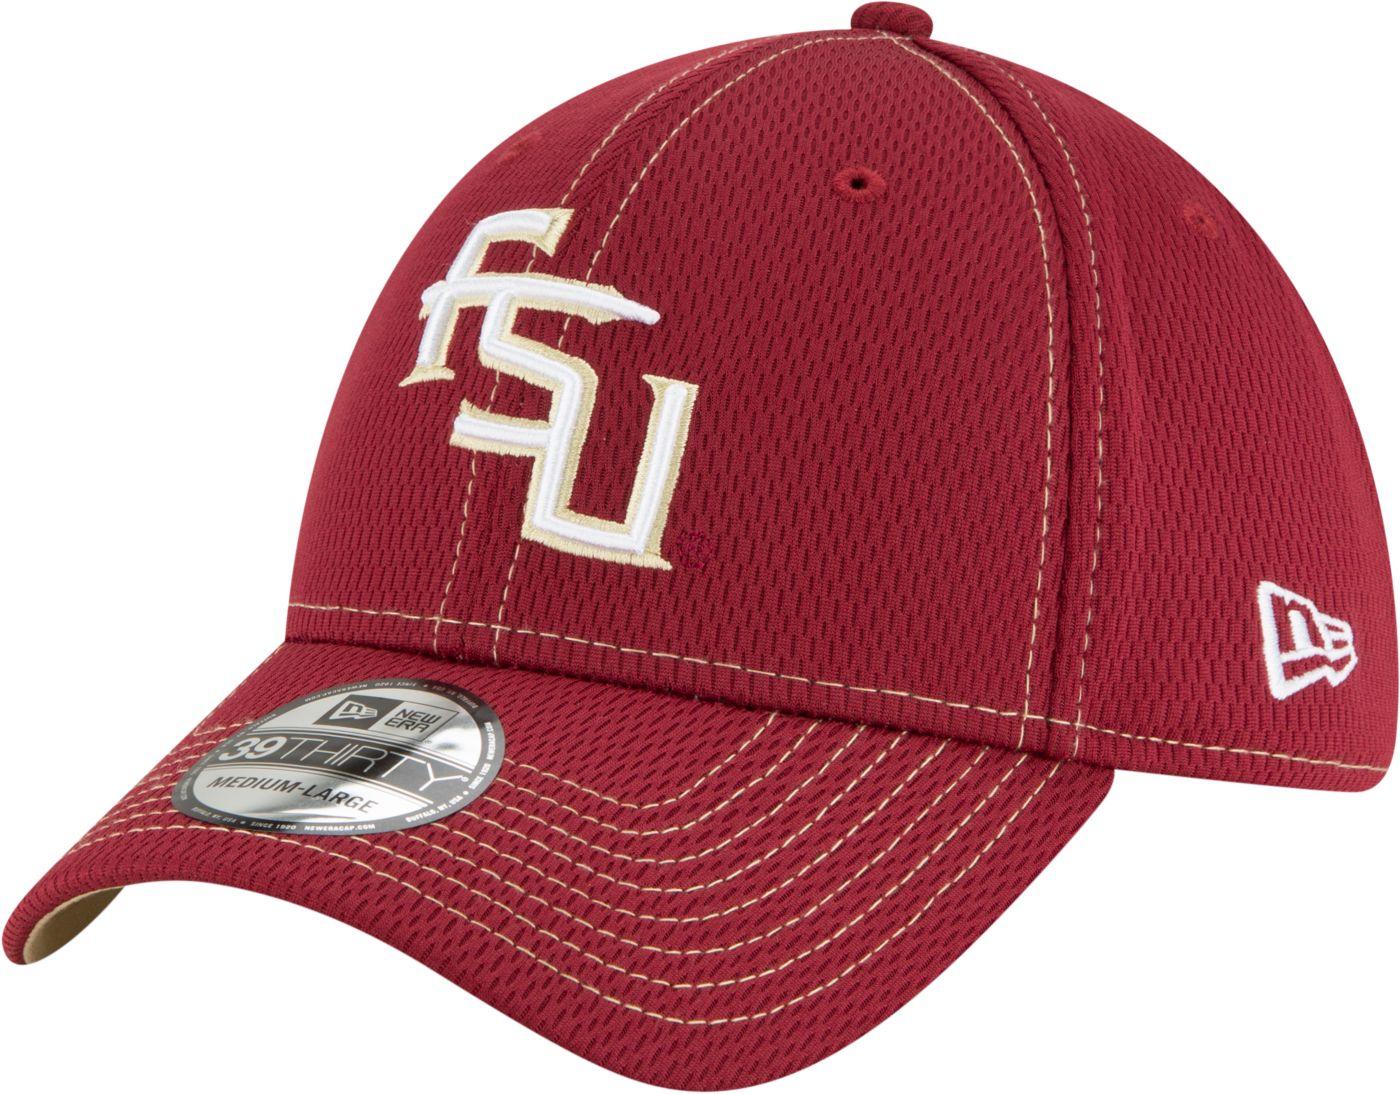 New Era Men's Florida State Seminoles Garnet Sideline Road 39Thirty Stretch Fit Hat